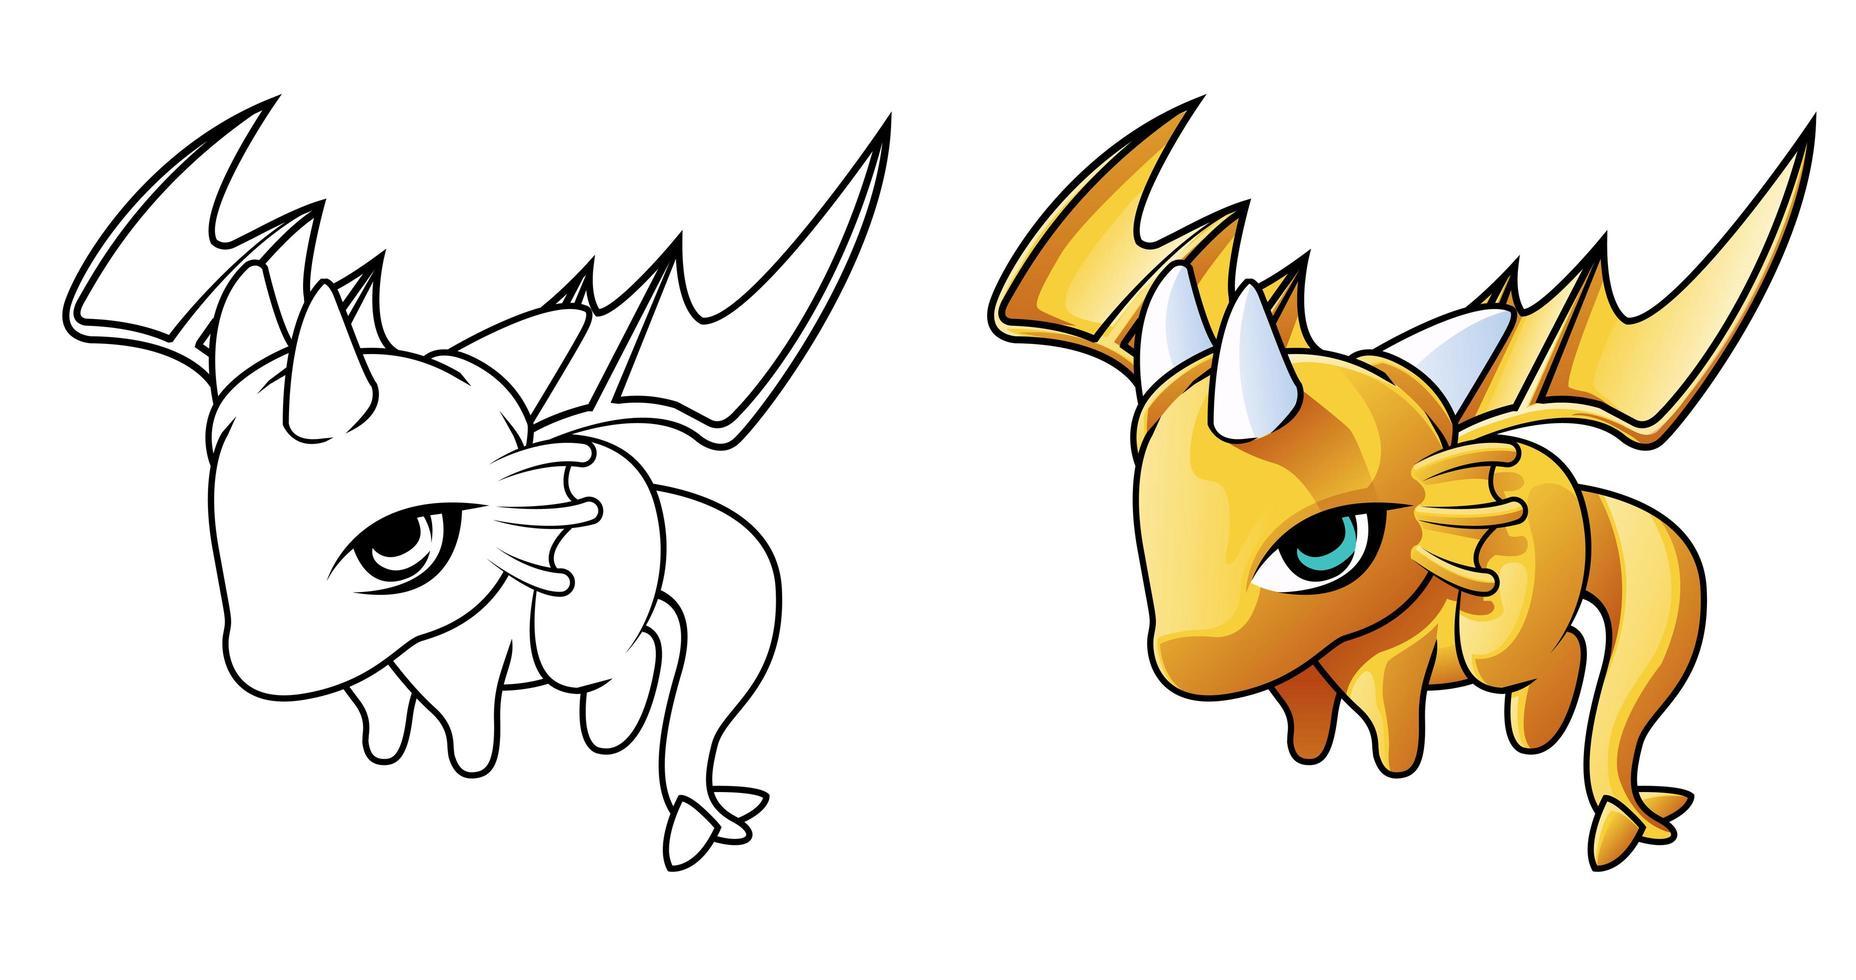 Baby dragon flying cartoon coloring page vector